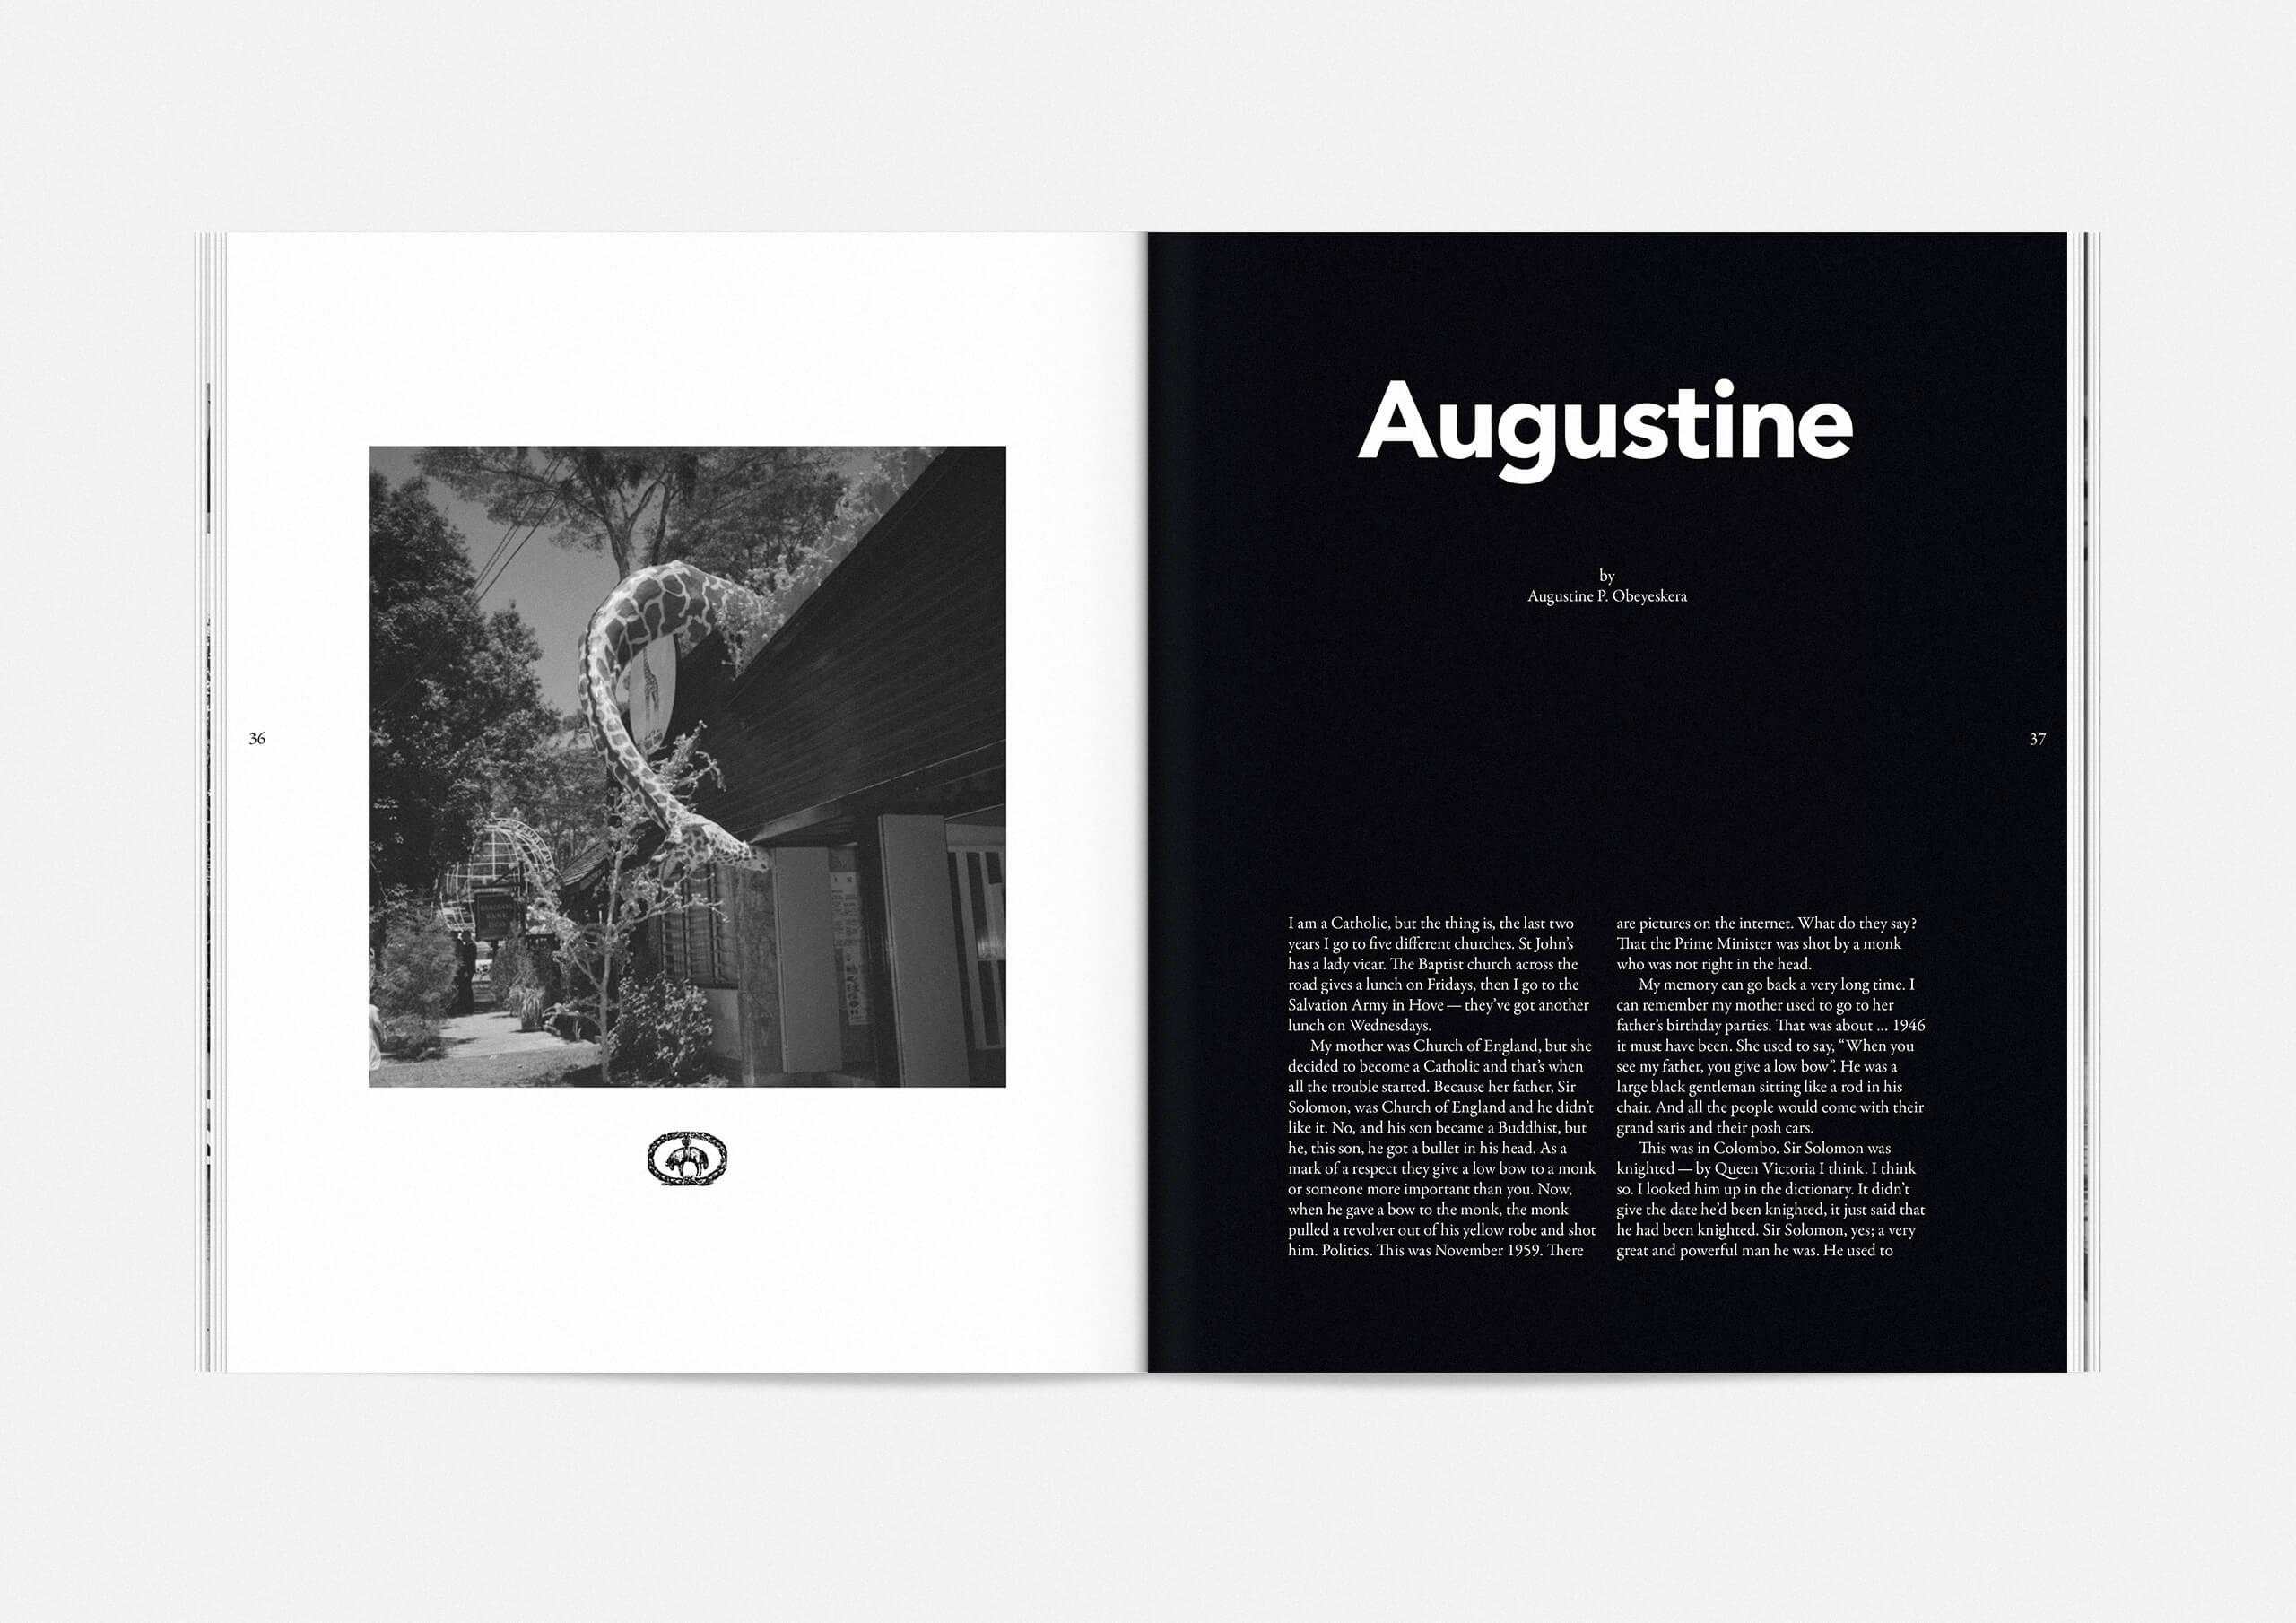 https://neuegestaltung.de/media/pages/clients/teller-magazine-issue-1/3df6e7c935-1597415429/teller_issue_01_innenseite_36_37_ng.jpg